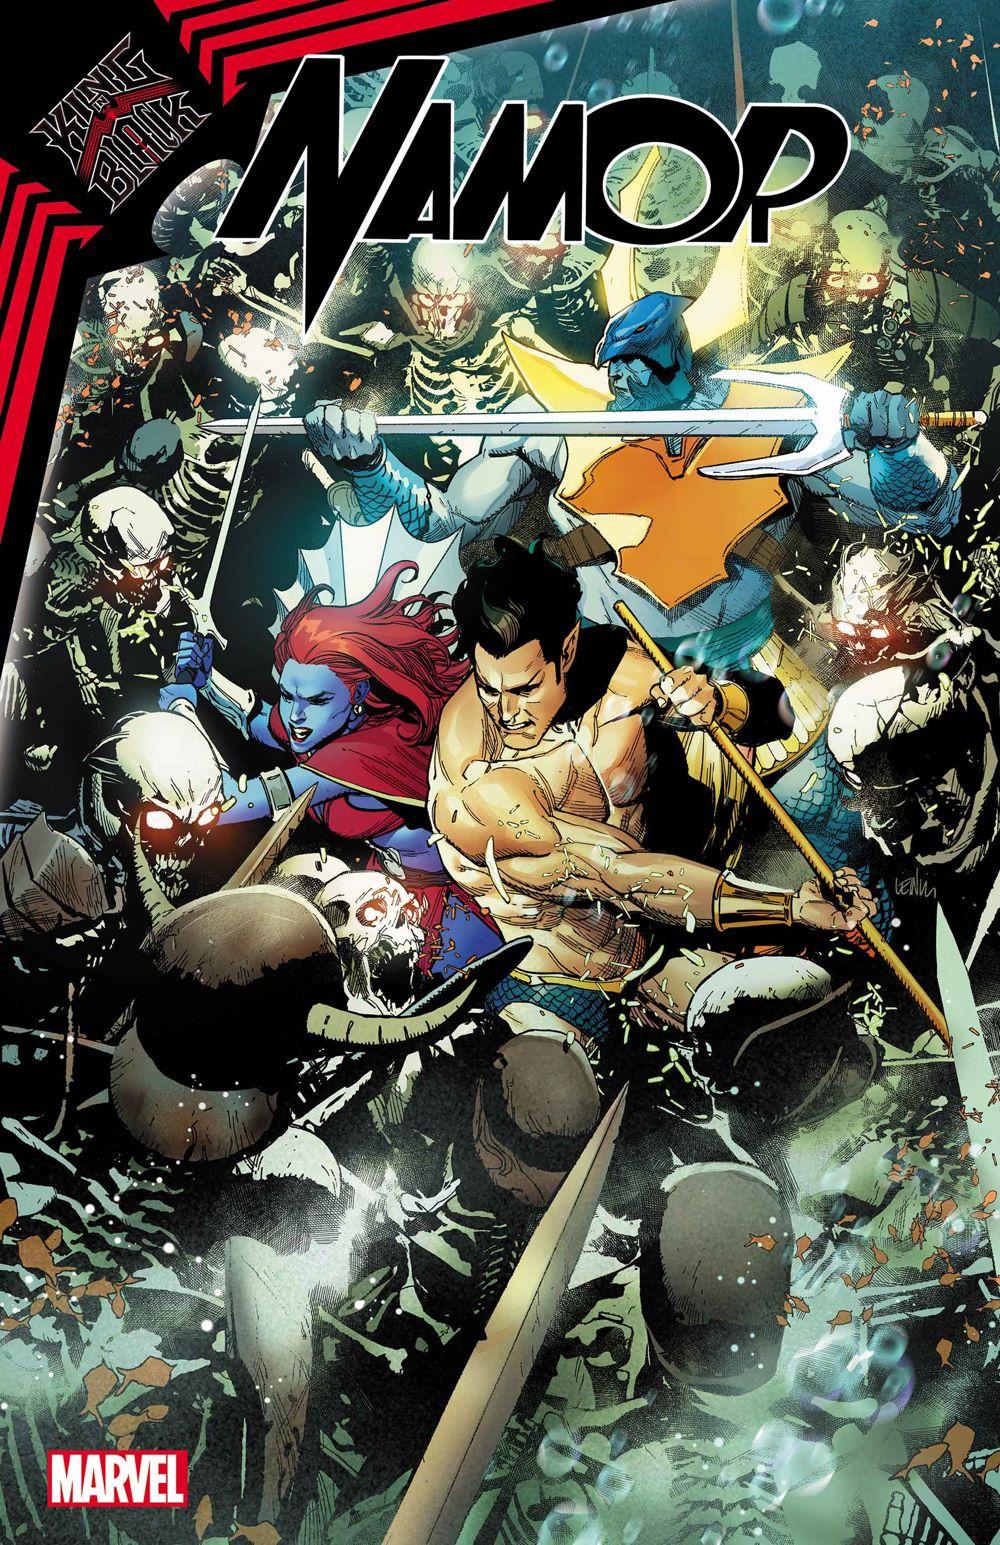 Conan the Barbarian 1-12 Complete Comic Lot Run Set Marvel Jason Aaron